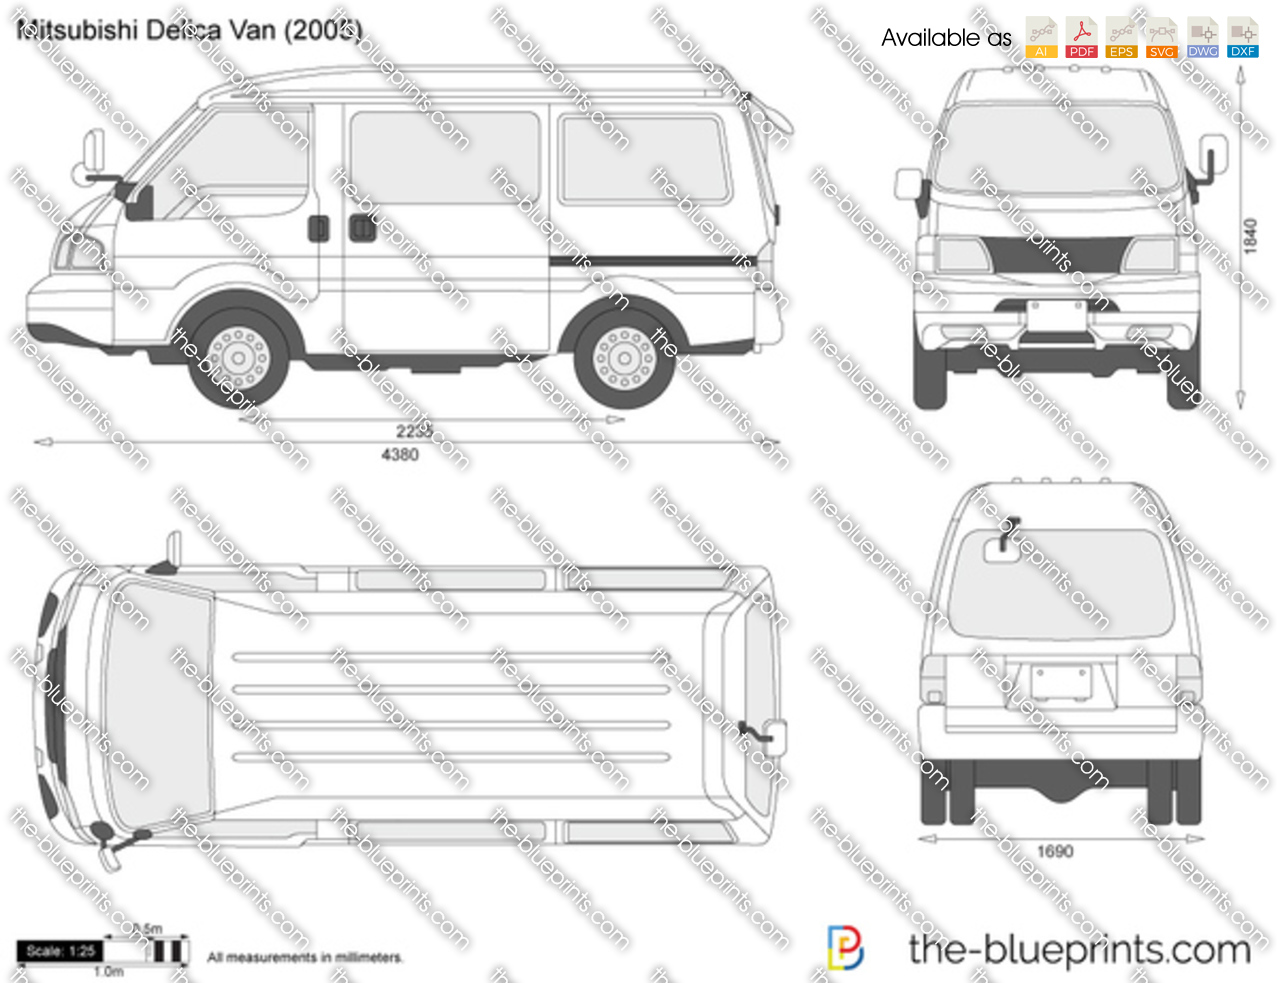 Mitsubishi Delica Van 1986